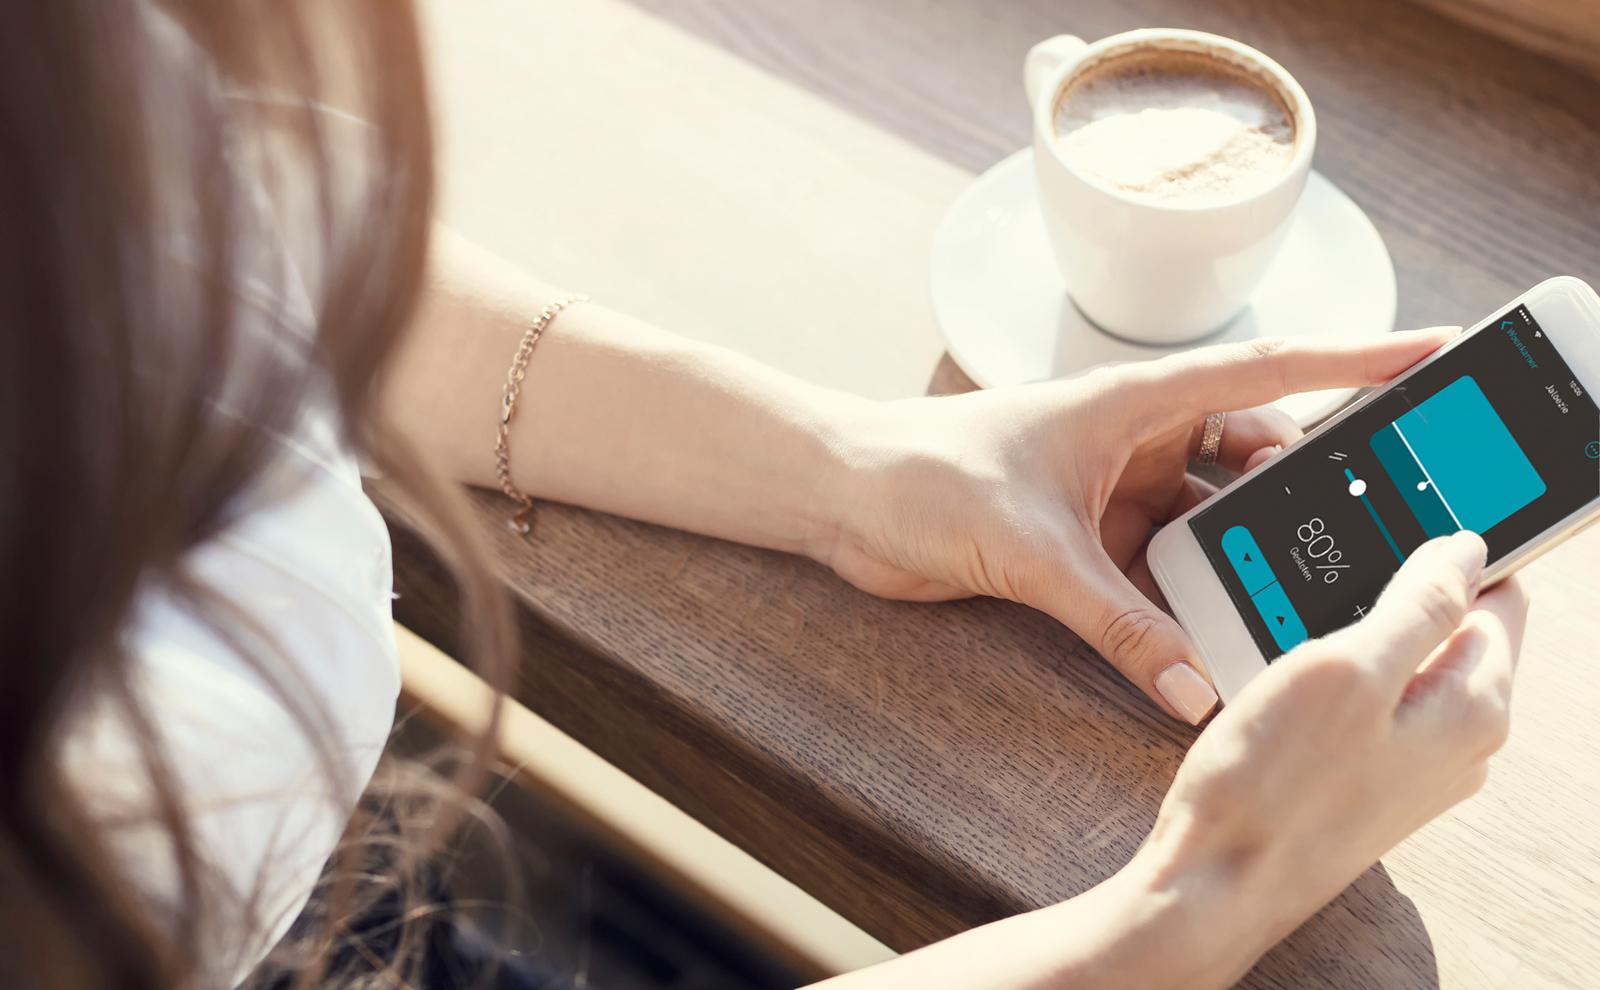 Gira eNet SMART HOME vanaf uw mobiele telefoon